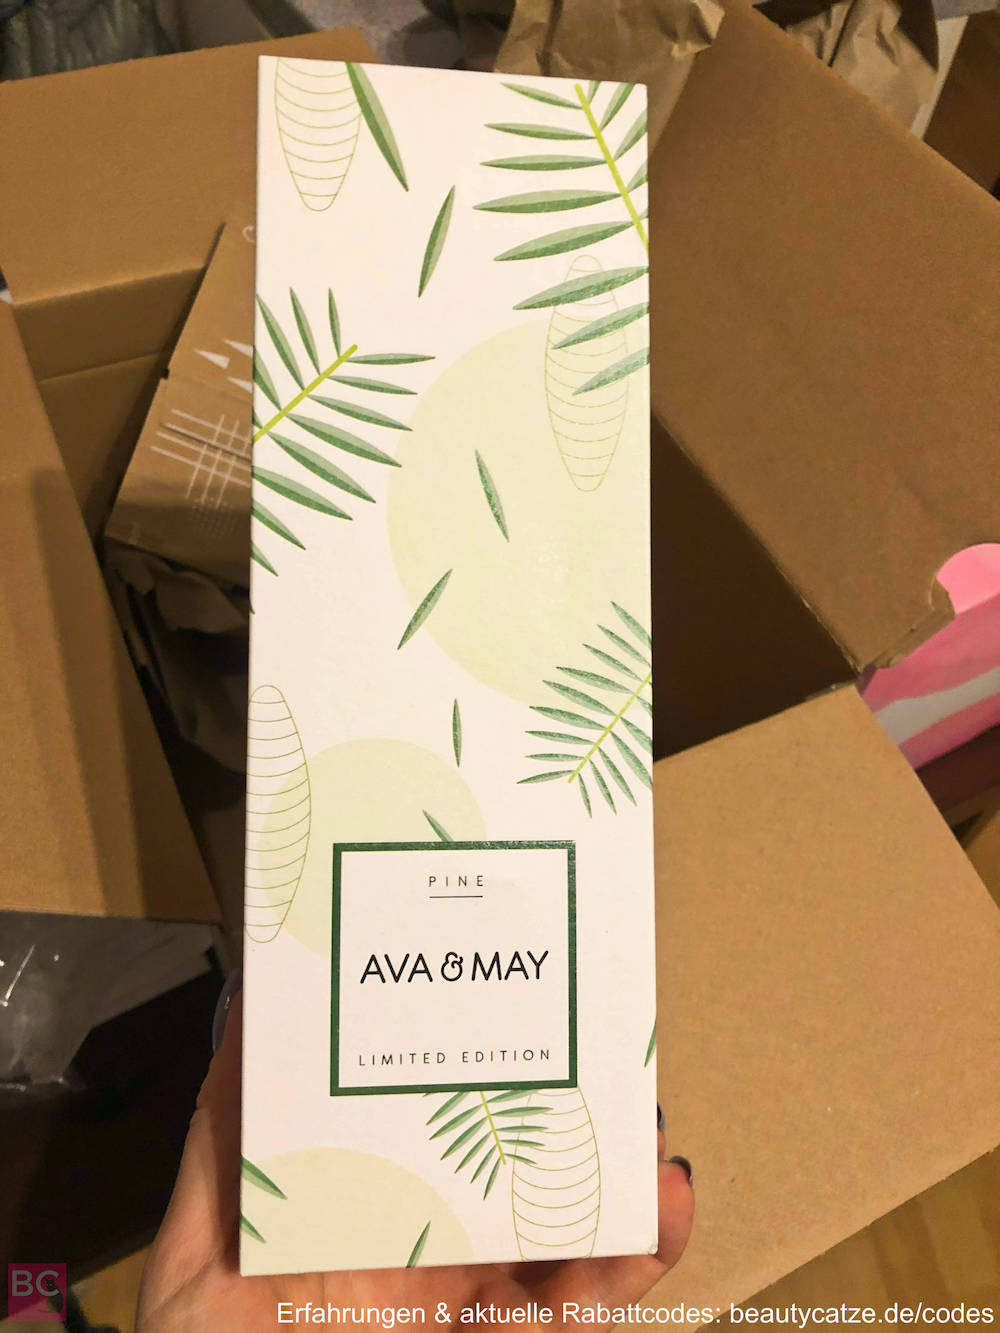 VERPACKUNG VERSAND DUFTSTÄBCHEN Ava and May Erfahrungen 200ml 100ml Vergleich Ava & May